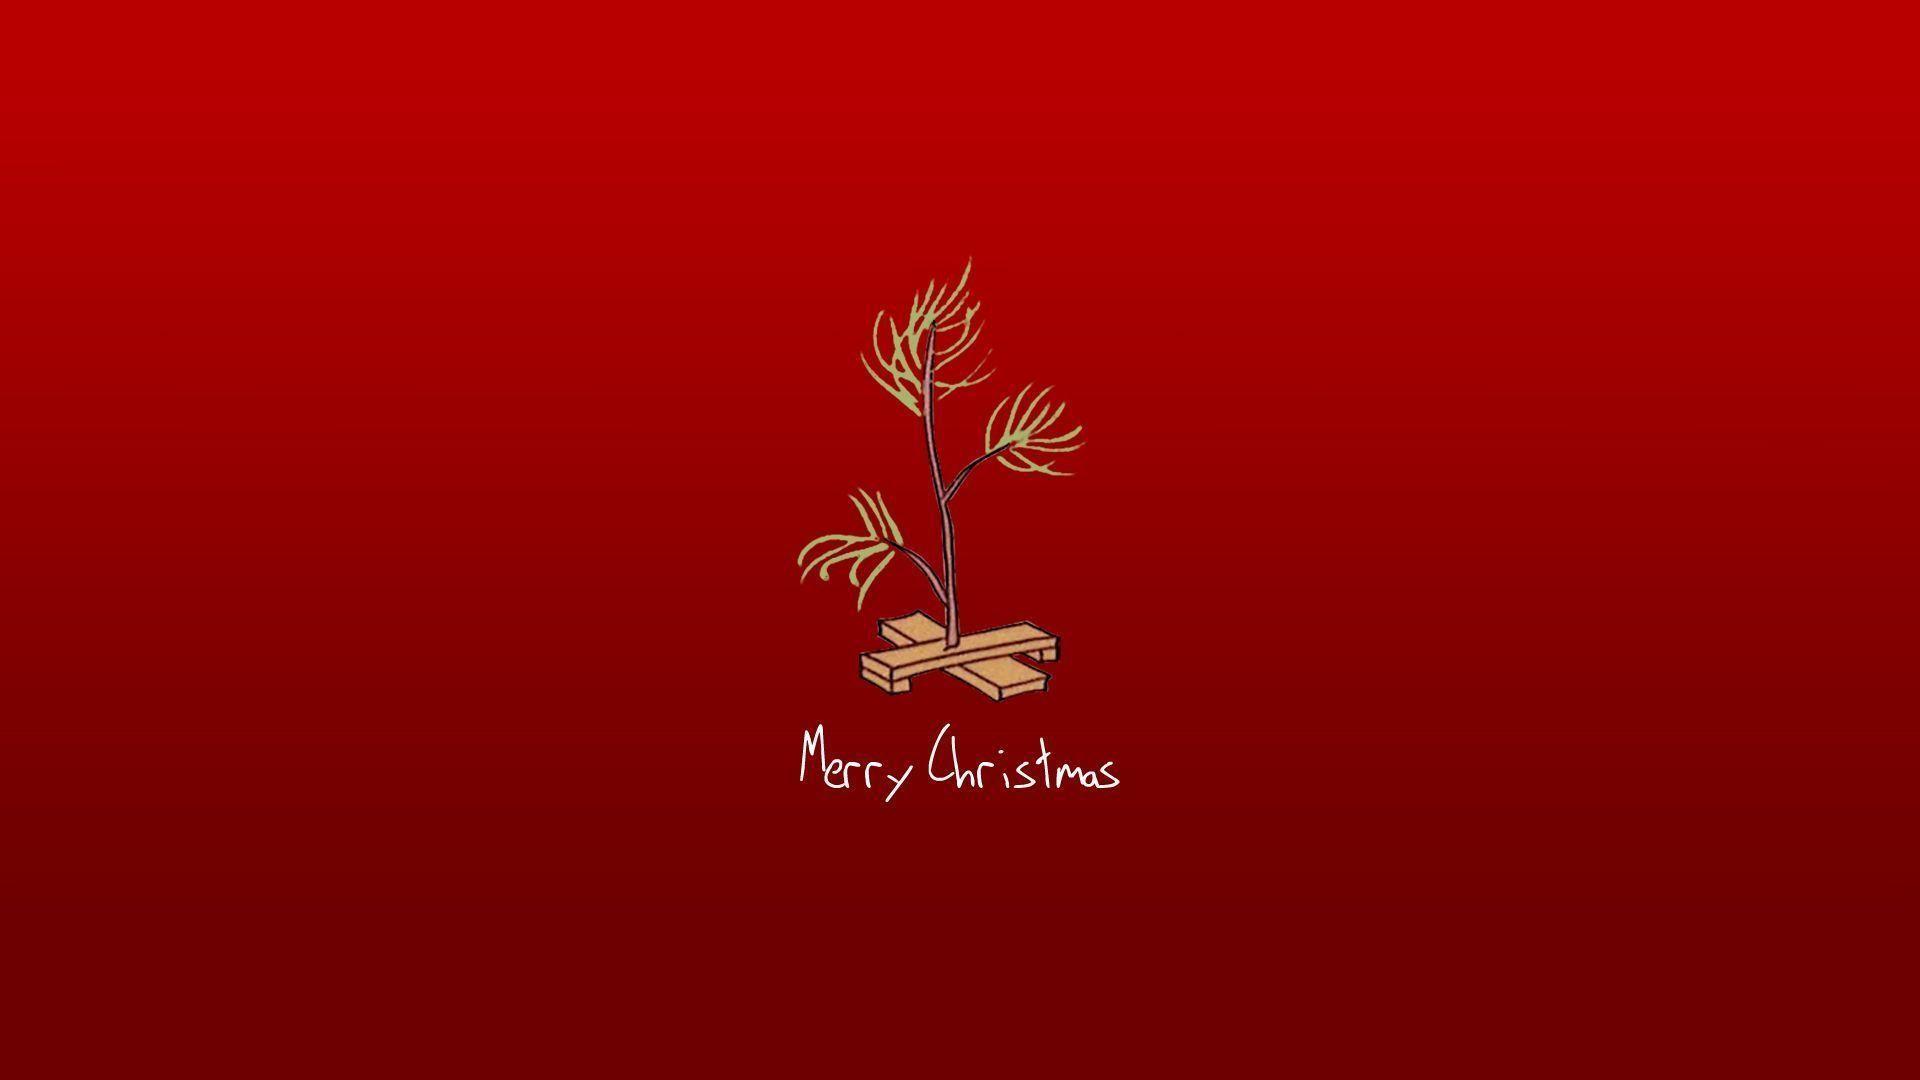 Free Charlie Brown Christmas Wallpapers – WallpaperSafari